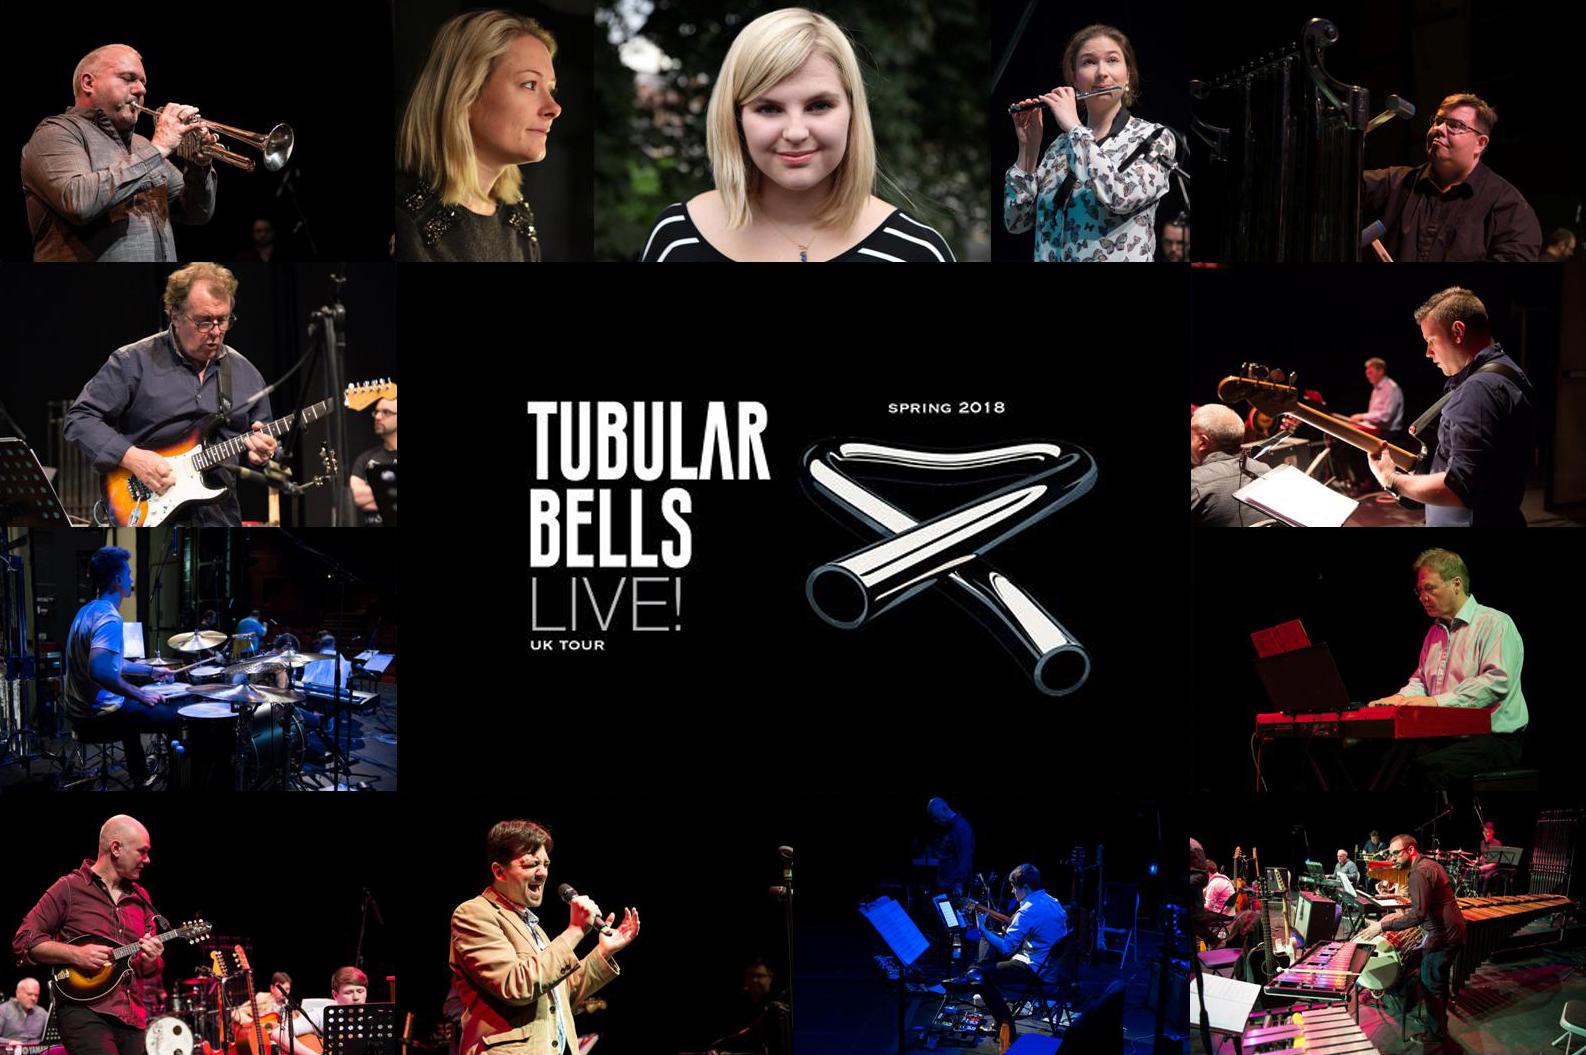 Tubular Bells ของ Mike Oldfield จะกลับมาแสดงในลอนดอนในฤดูร้อนนี้ 1